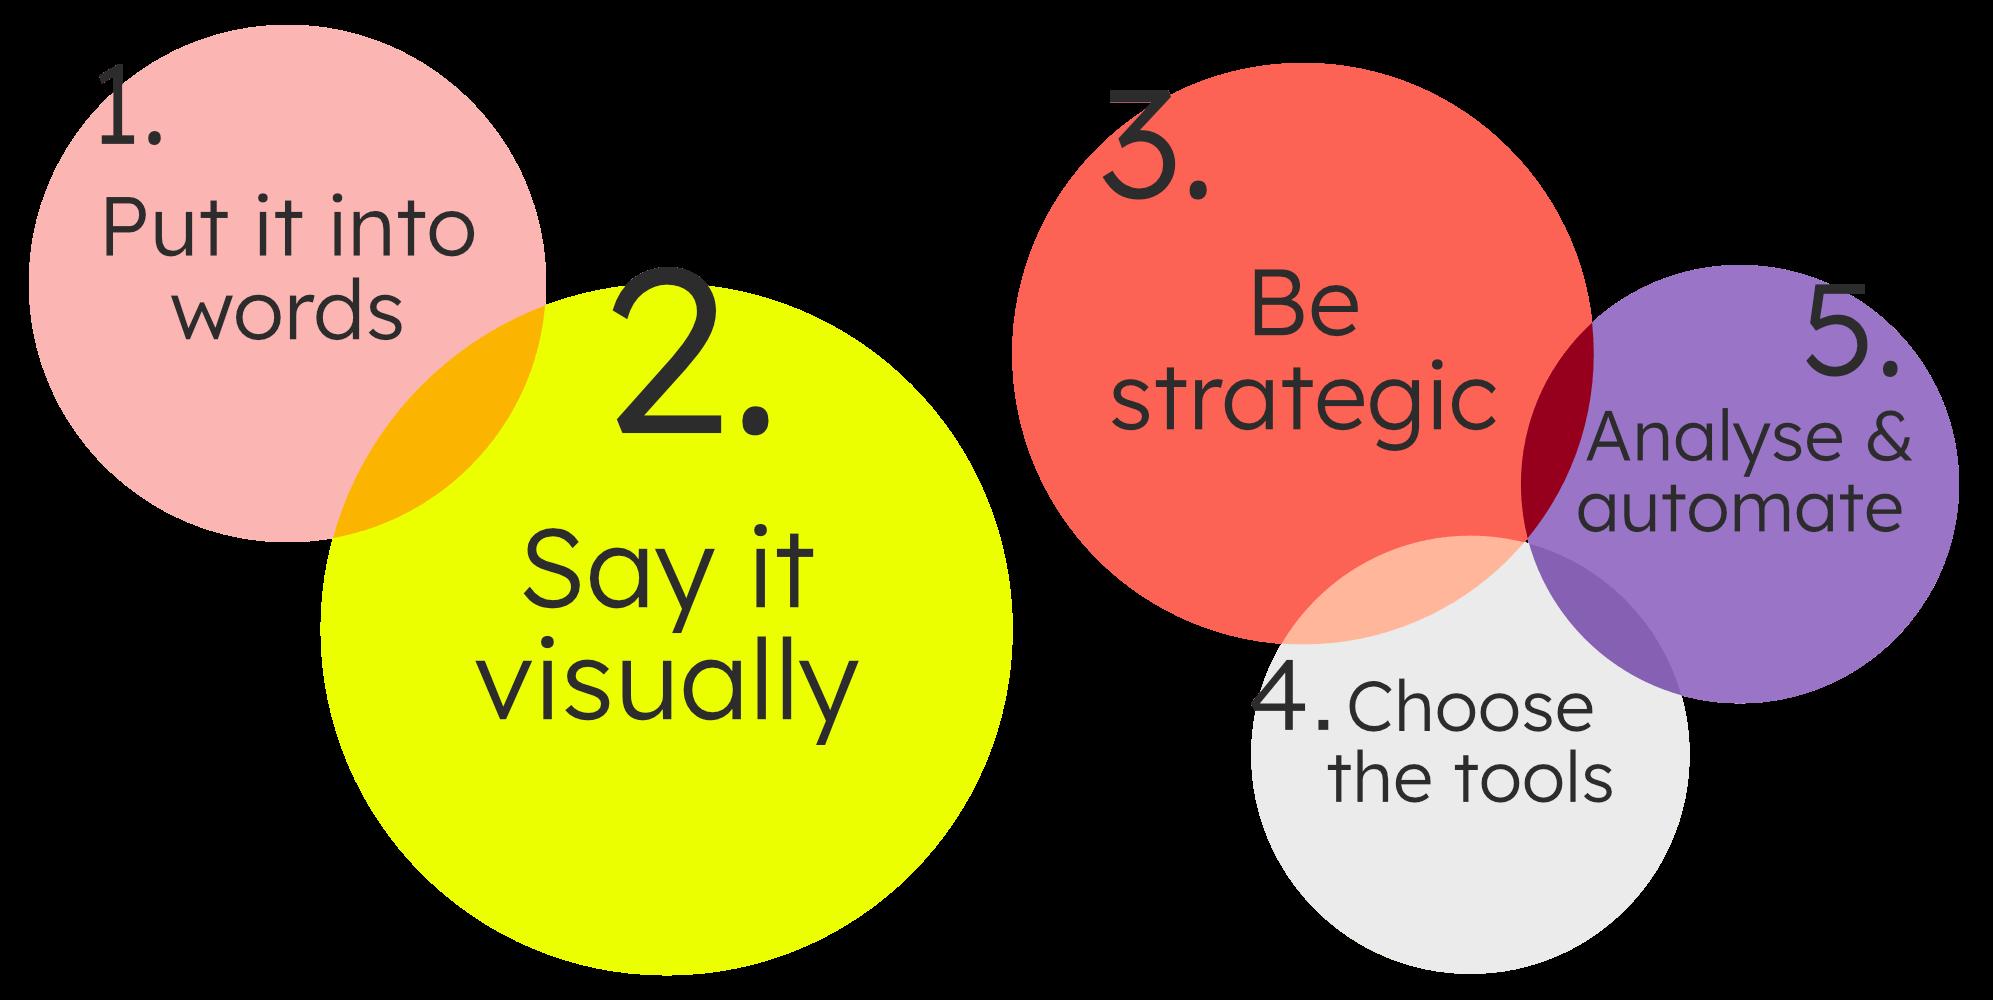 5-steps method to branding, web design and marketing